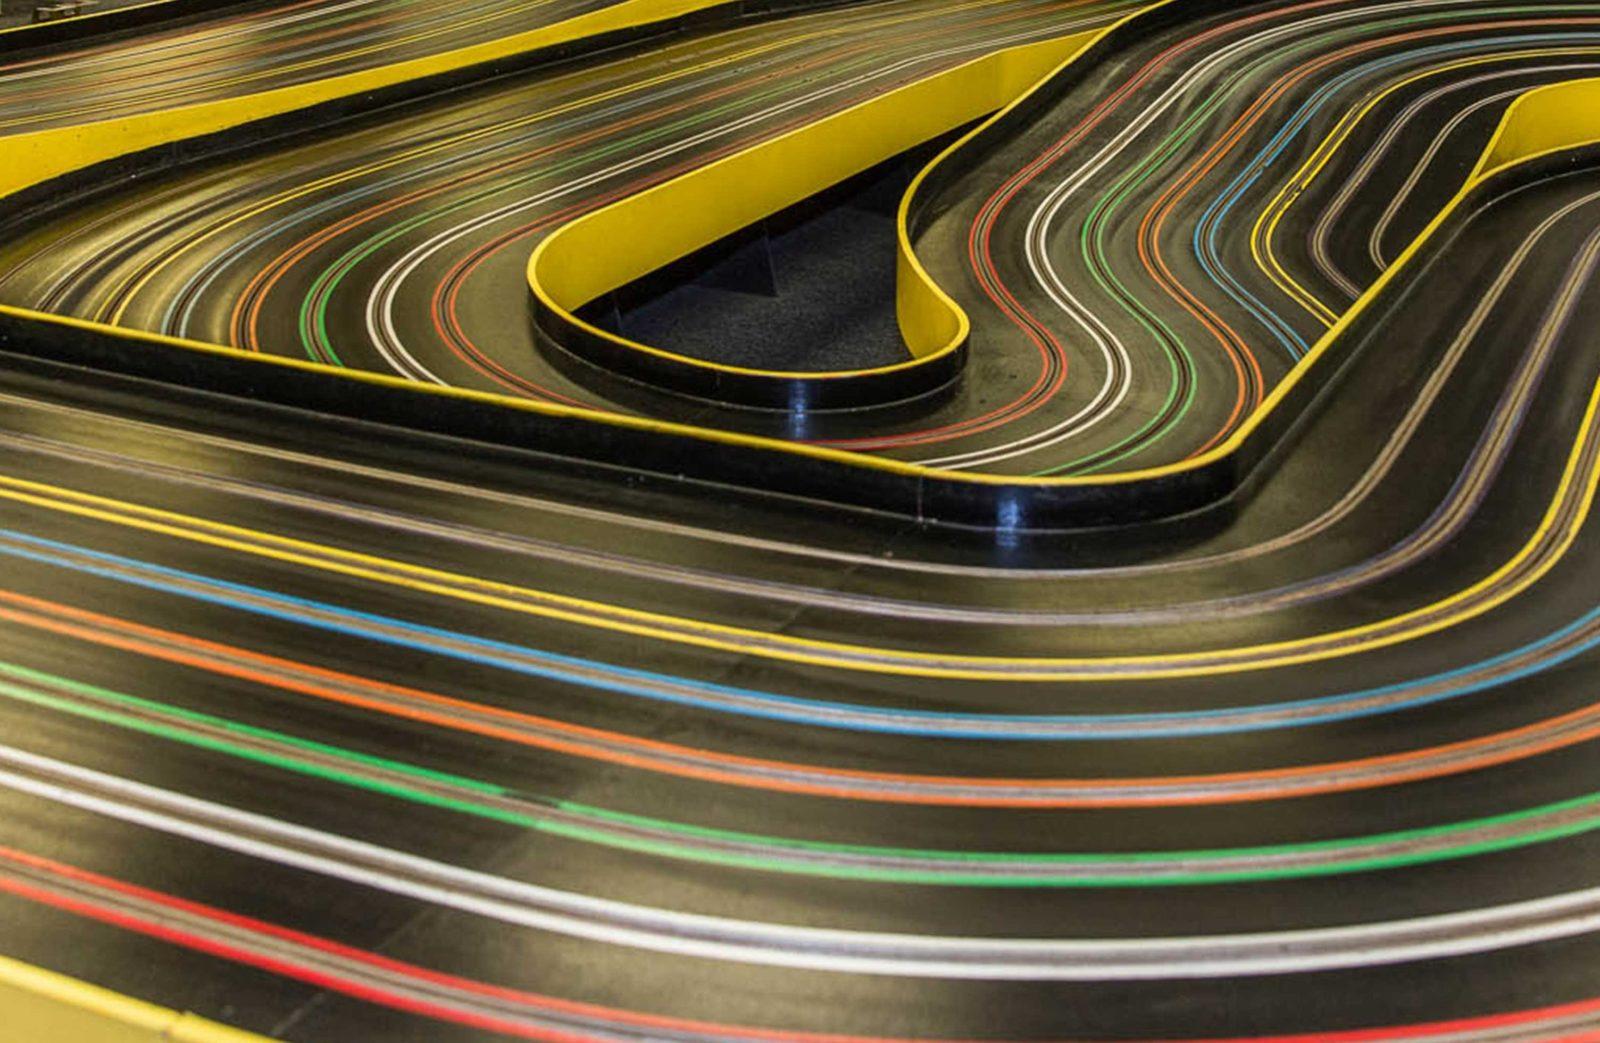 Image of a slot car Track